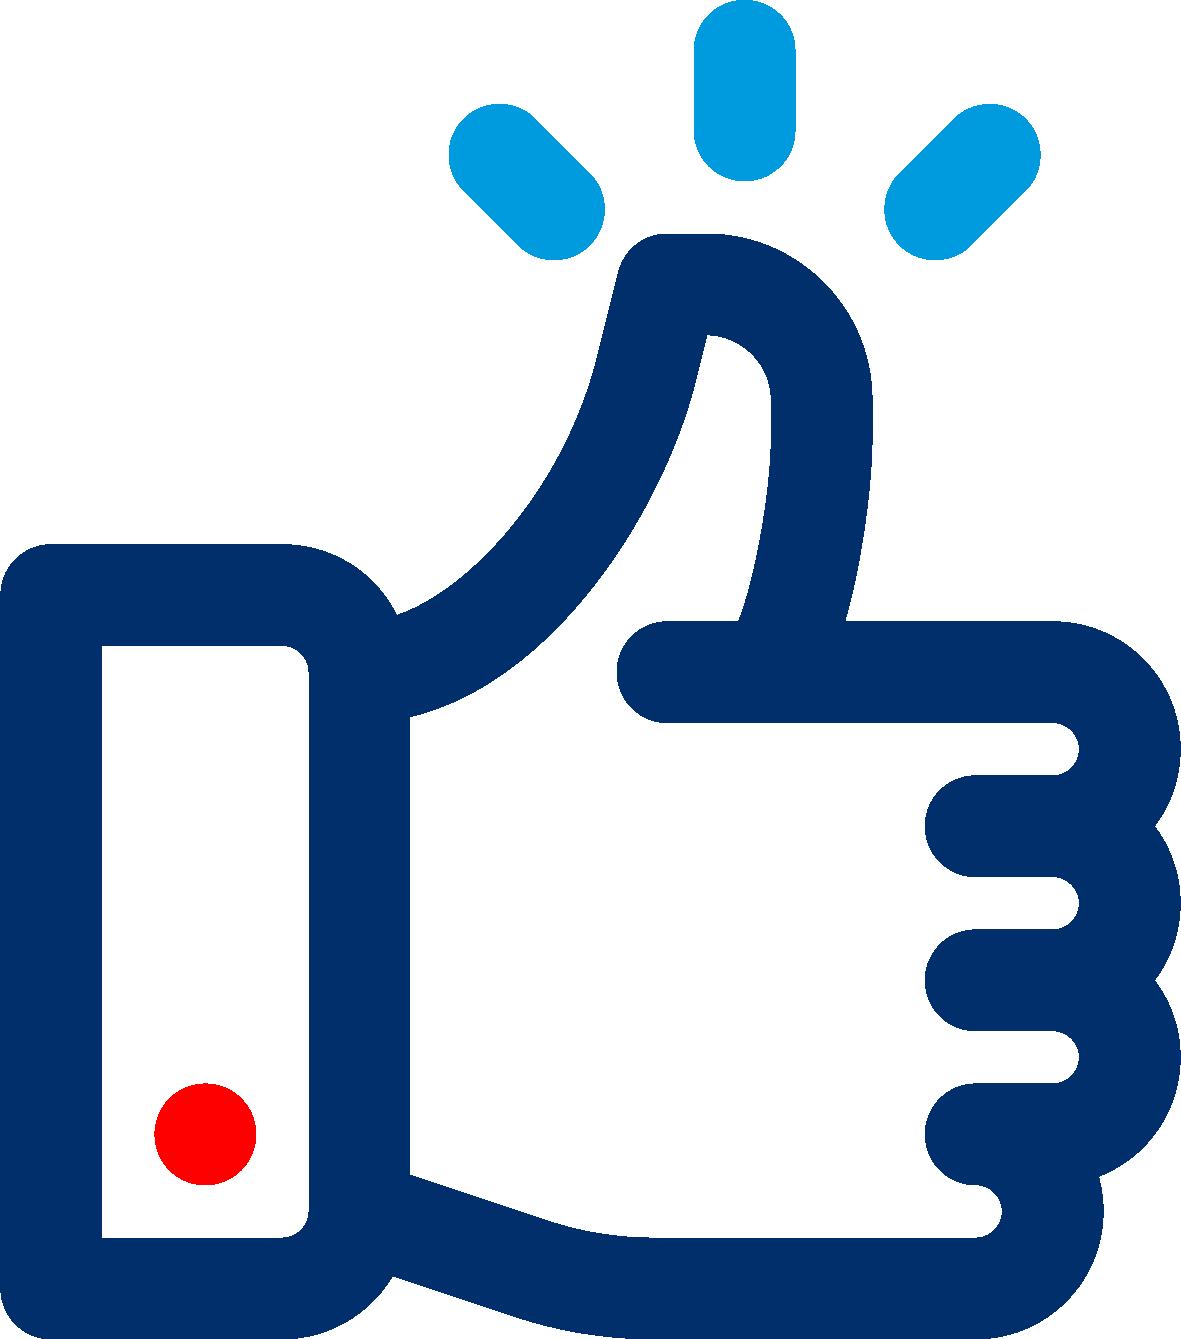 Thumbs-up icoon